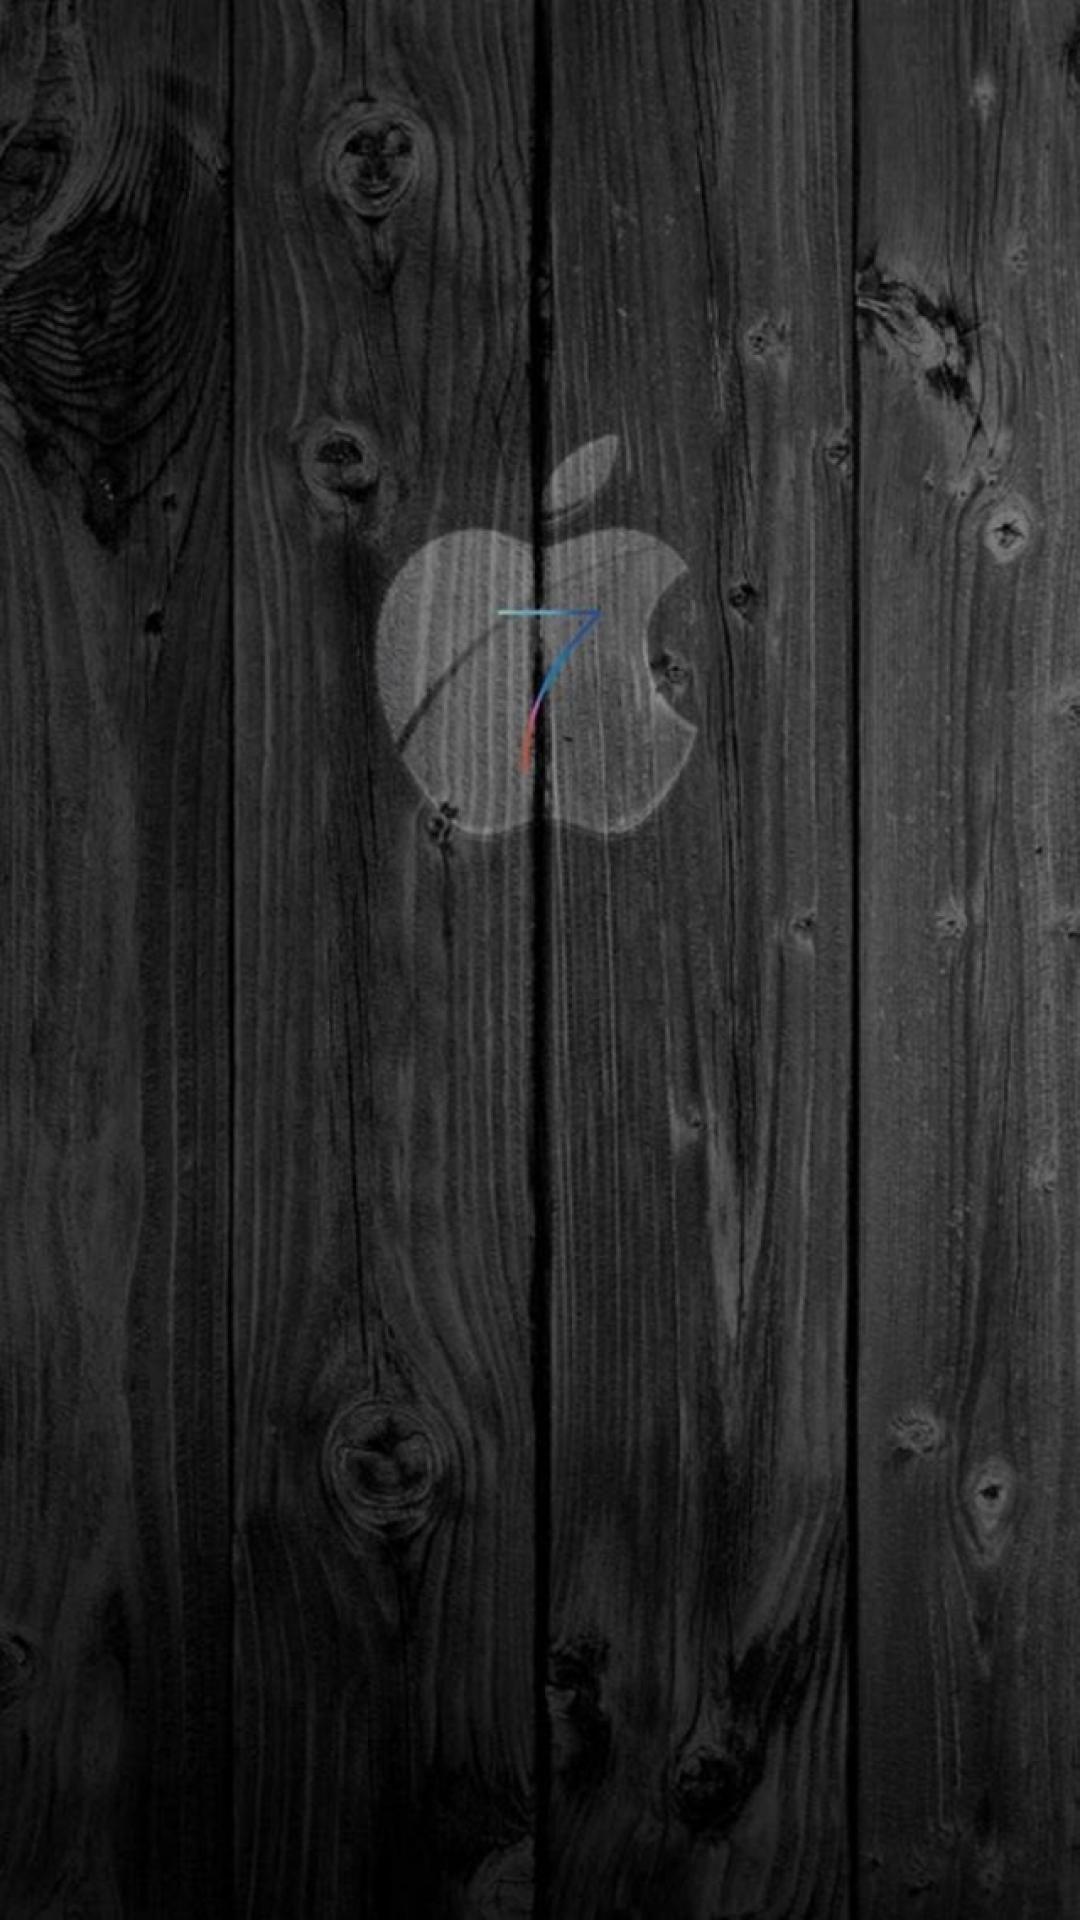 Iphone 6 Retina Wallpaper Wood Wallpaper Iphone 6 Wallpaper